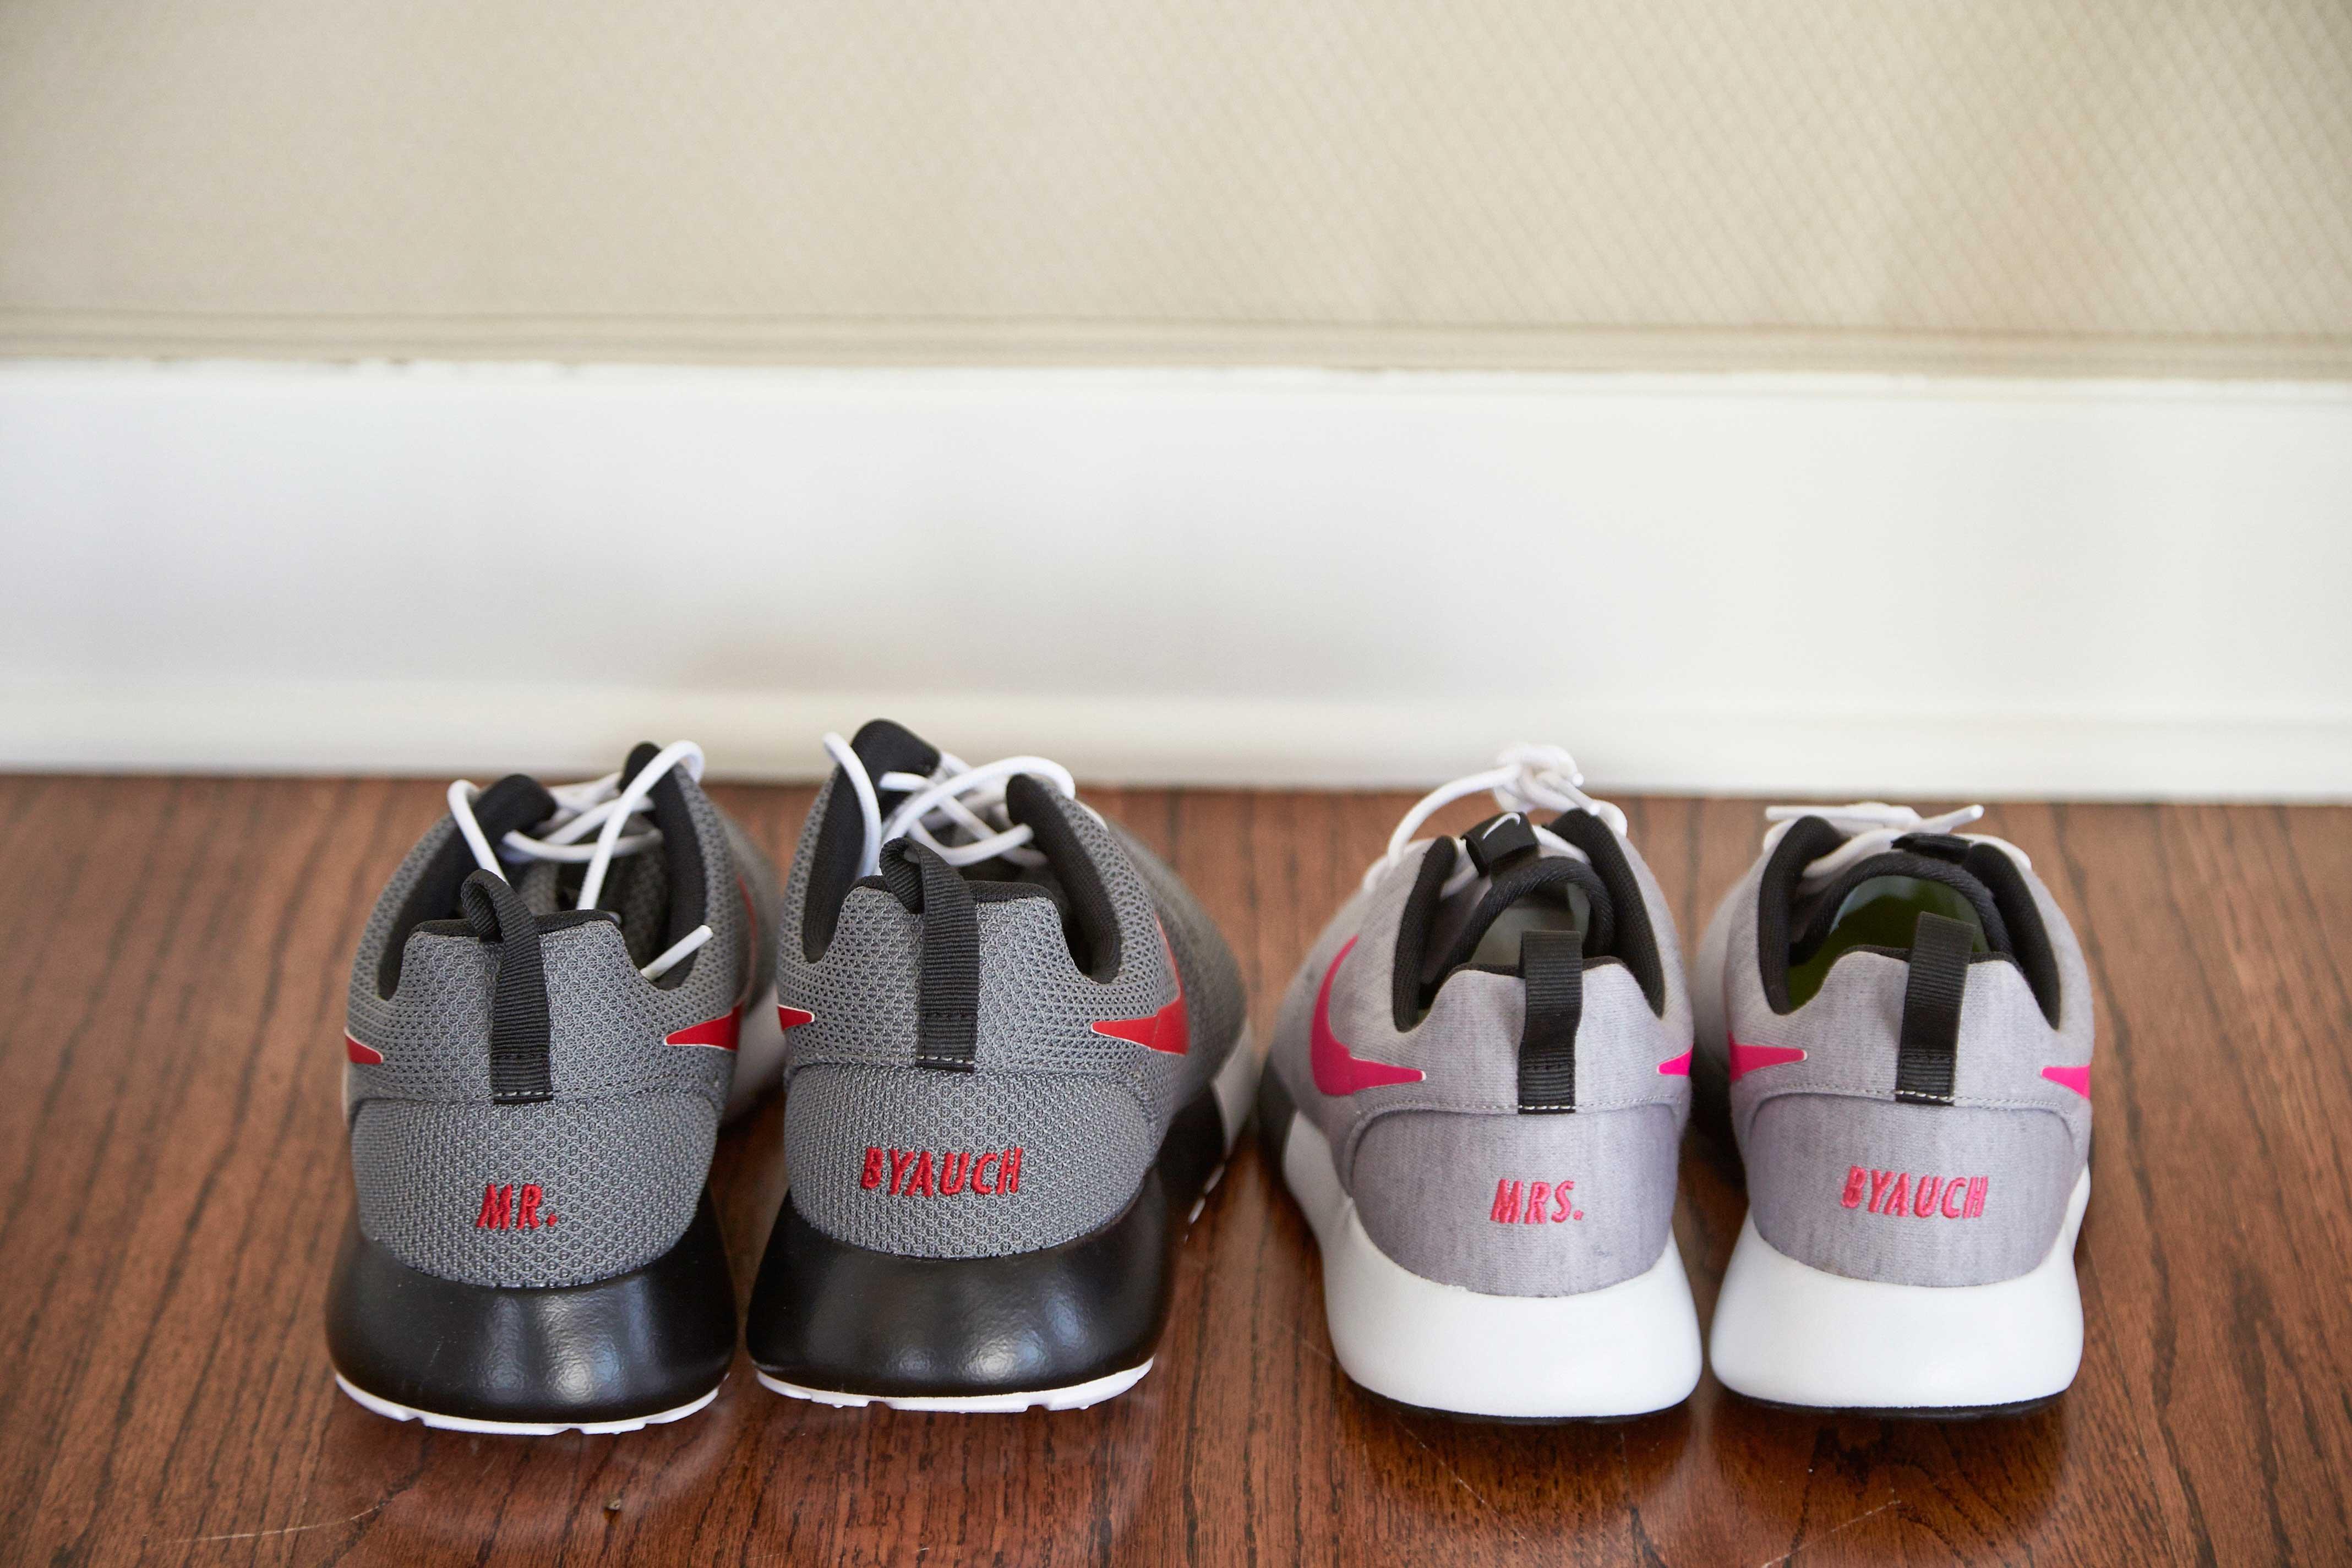 Custom Nike Shoes for Bride \u0026 Groom